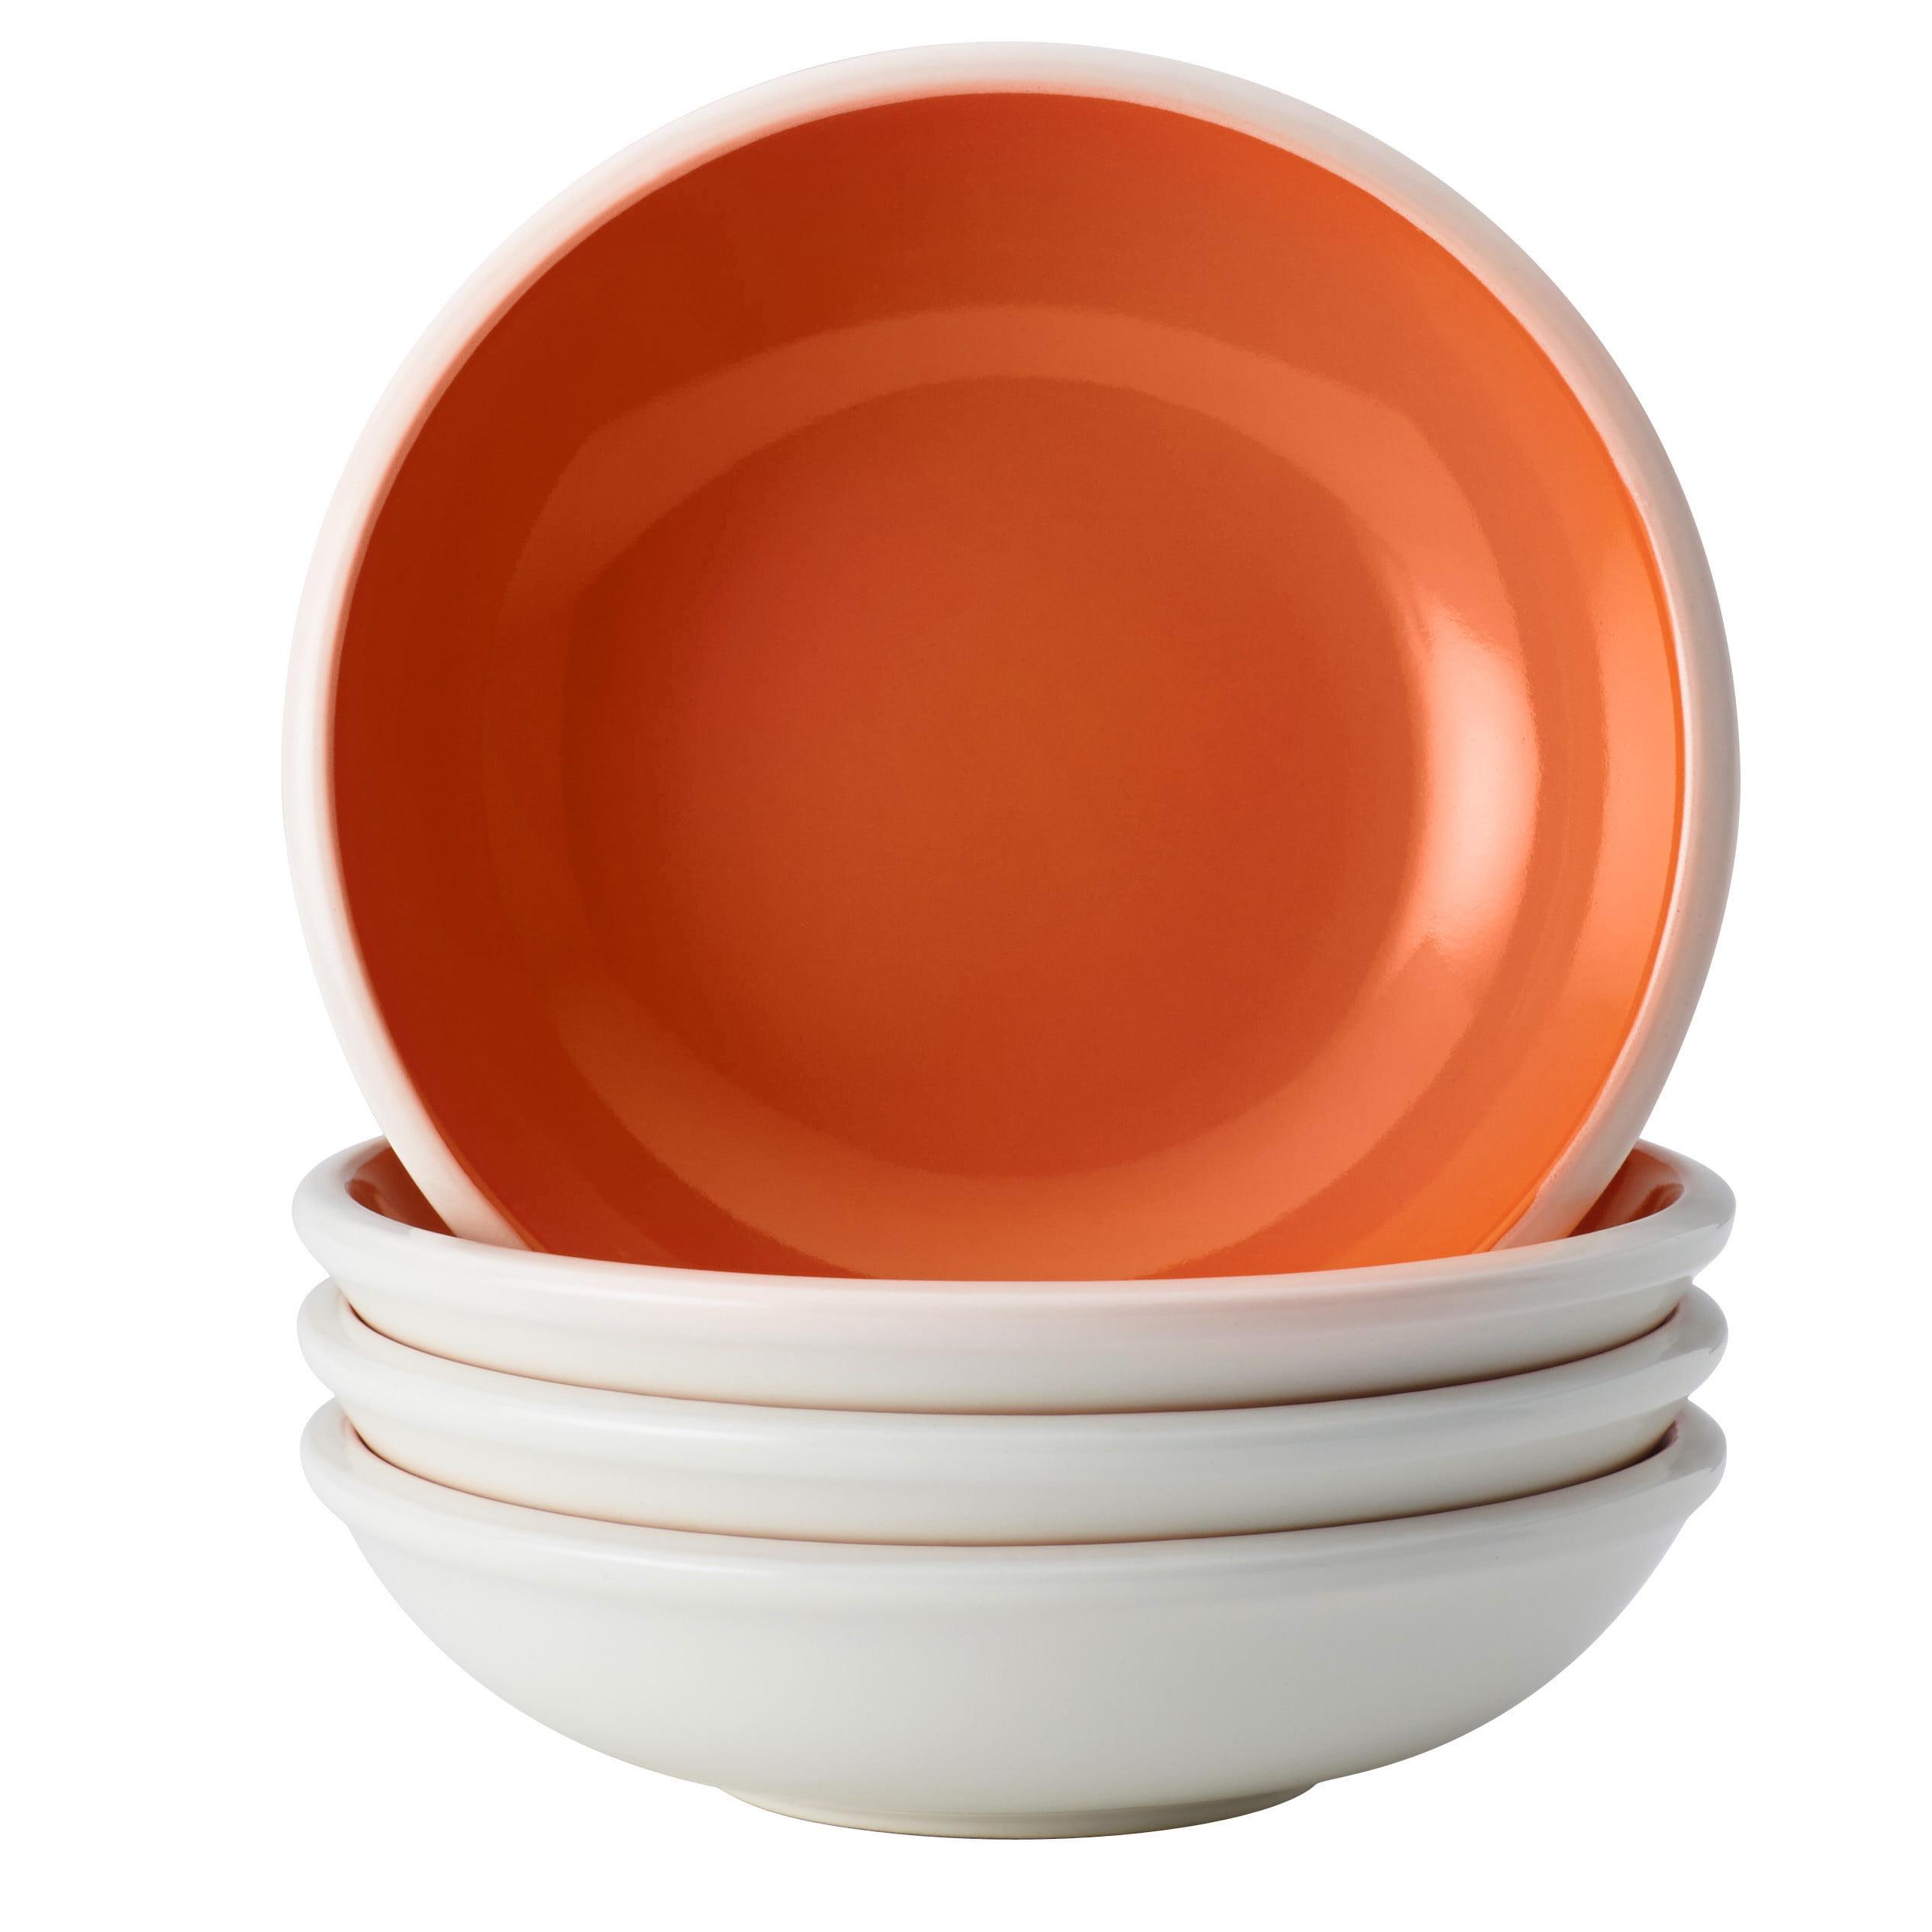 Rachael Ray Dinnerware Rise 4-Piece Stoneware Fruit Bowl Set, Orange